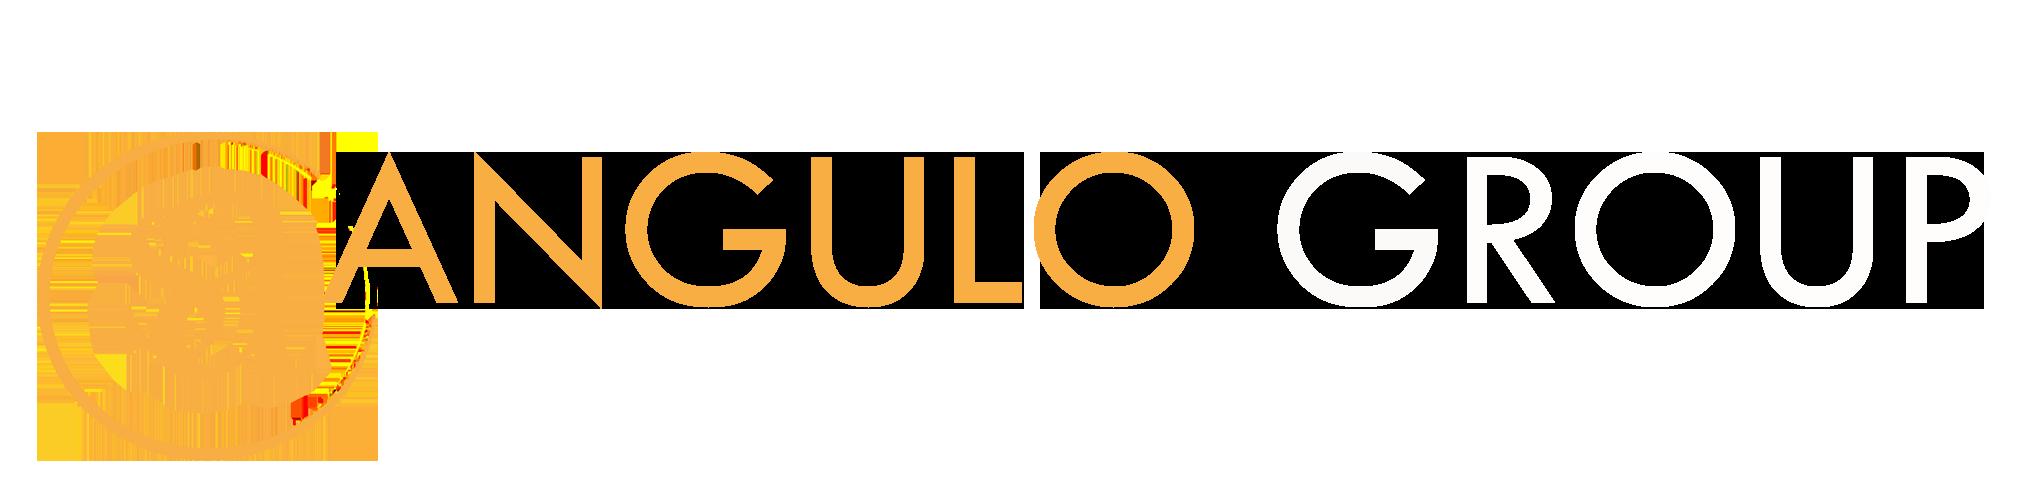 The Angulo Group